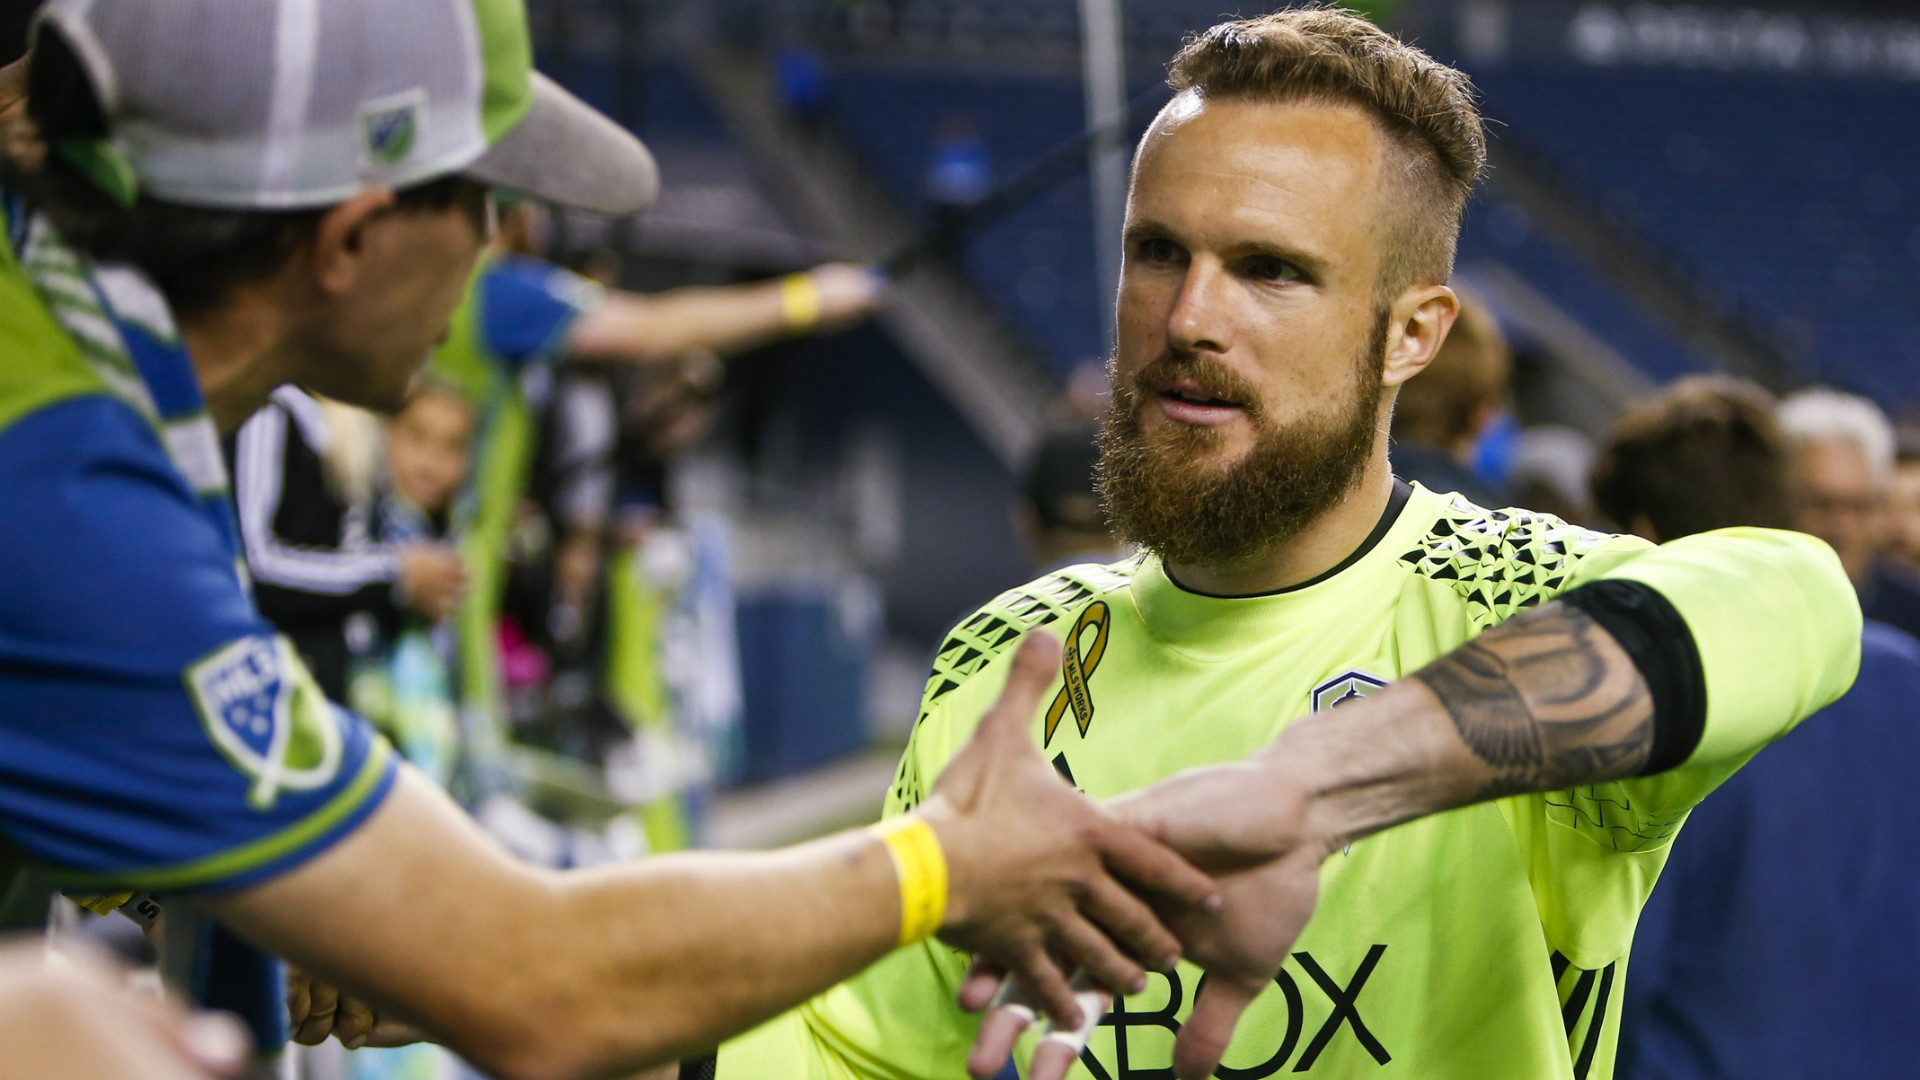 Stefan Frei returns to Toronto hoping to win MLS Cup | Goal.com